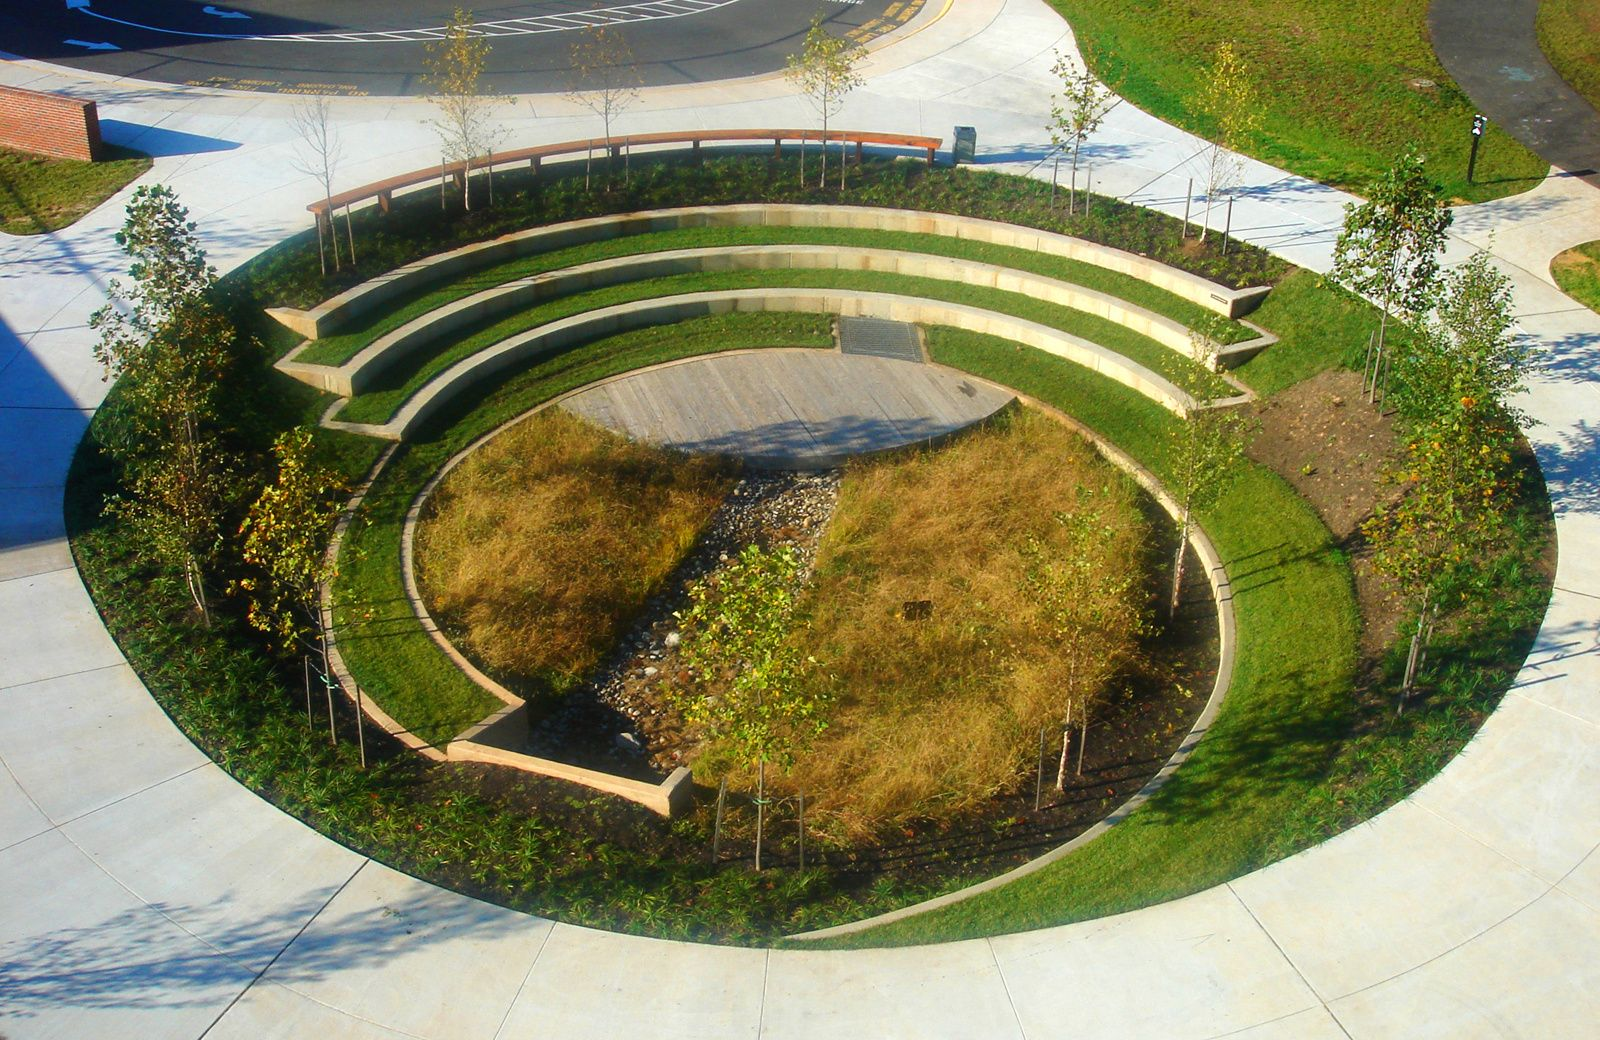 Bioswale amphitheater | Landscape by Design | Pinterest ...